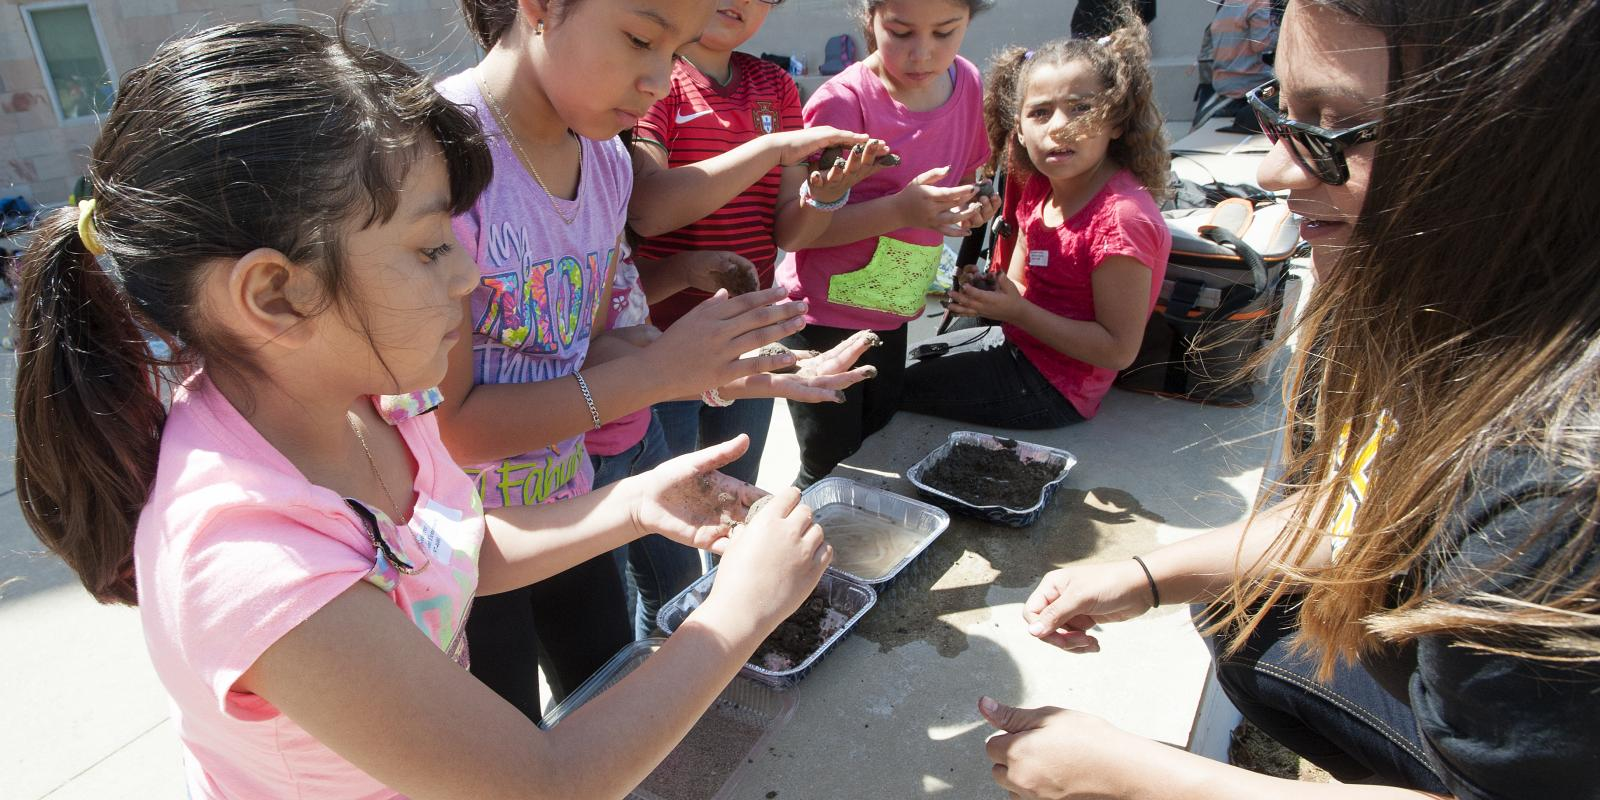 Westmont Elementary School students make seed balls as part of the Regenerative Community Fellowship Program, April 8, 2015